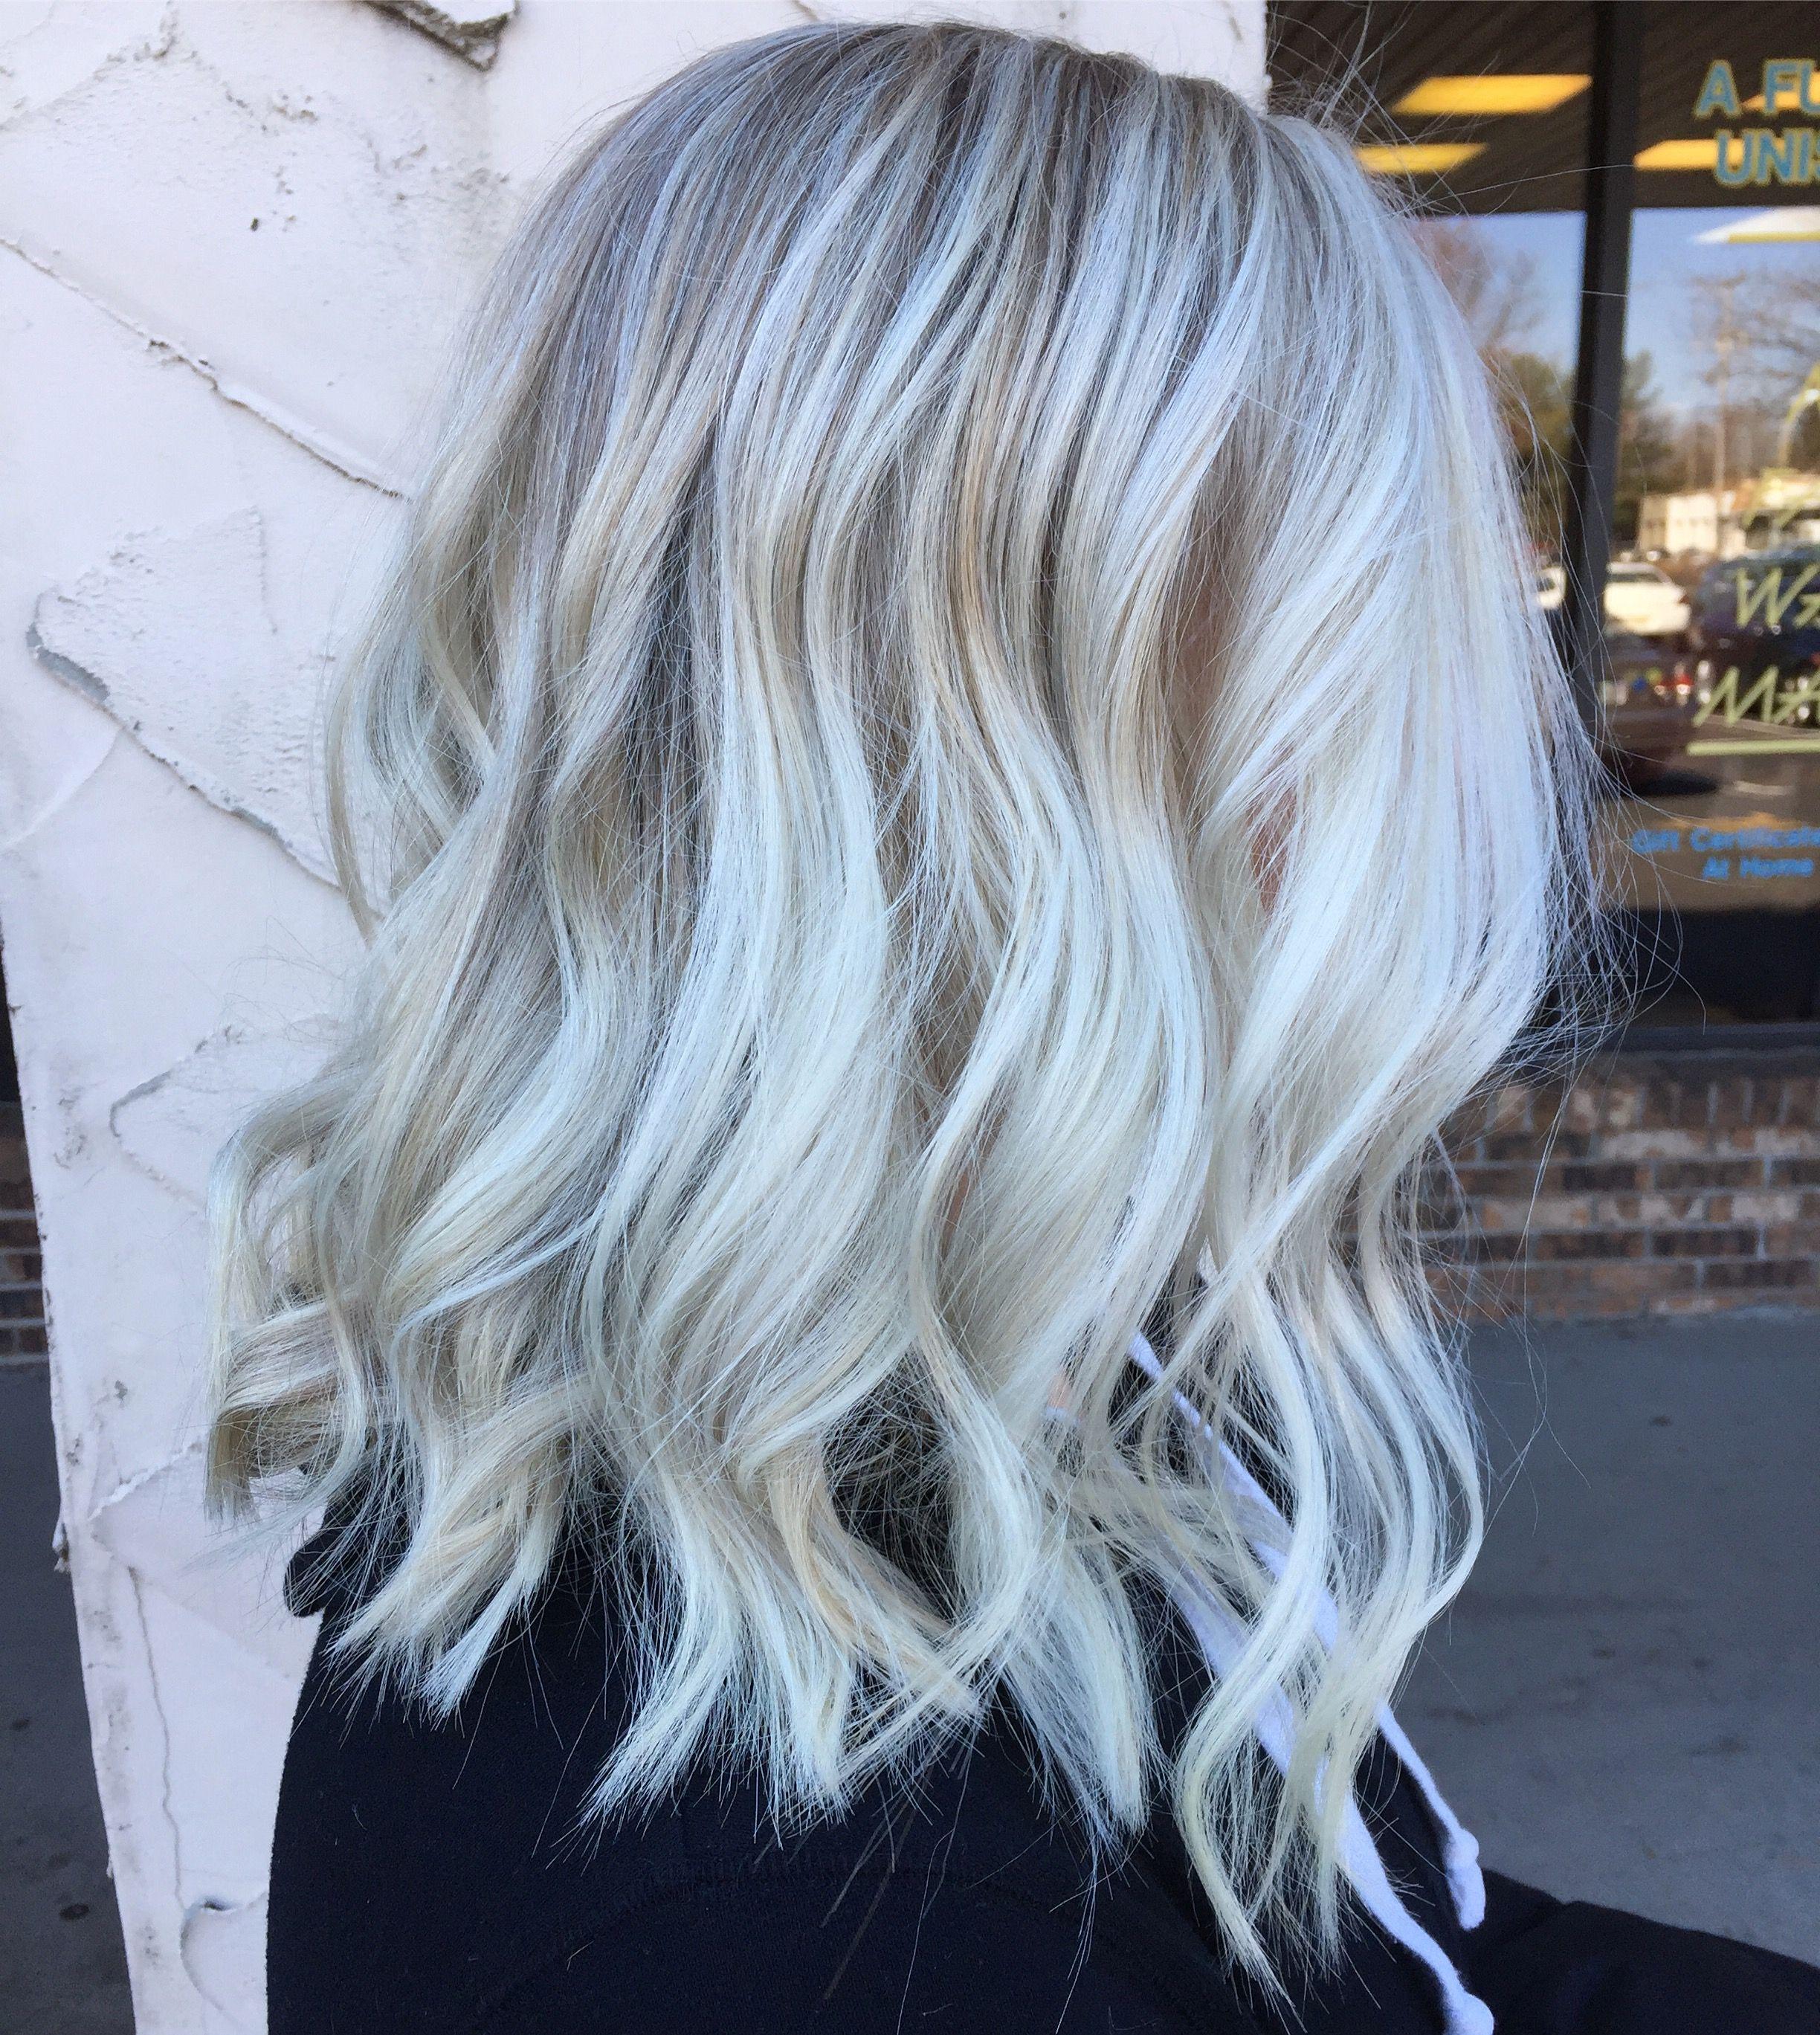 Icey blonde @hair_by_lah   HAIR ️   Ice blonde hair ...